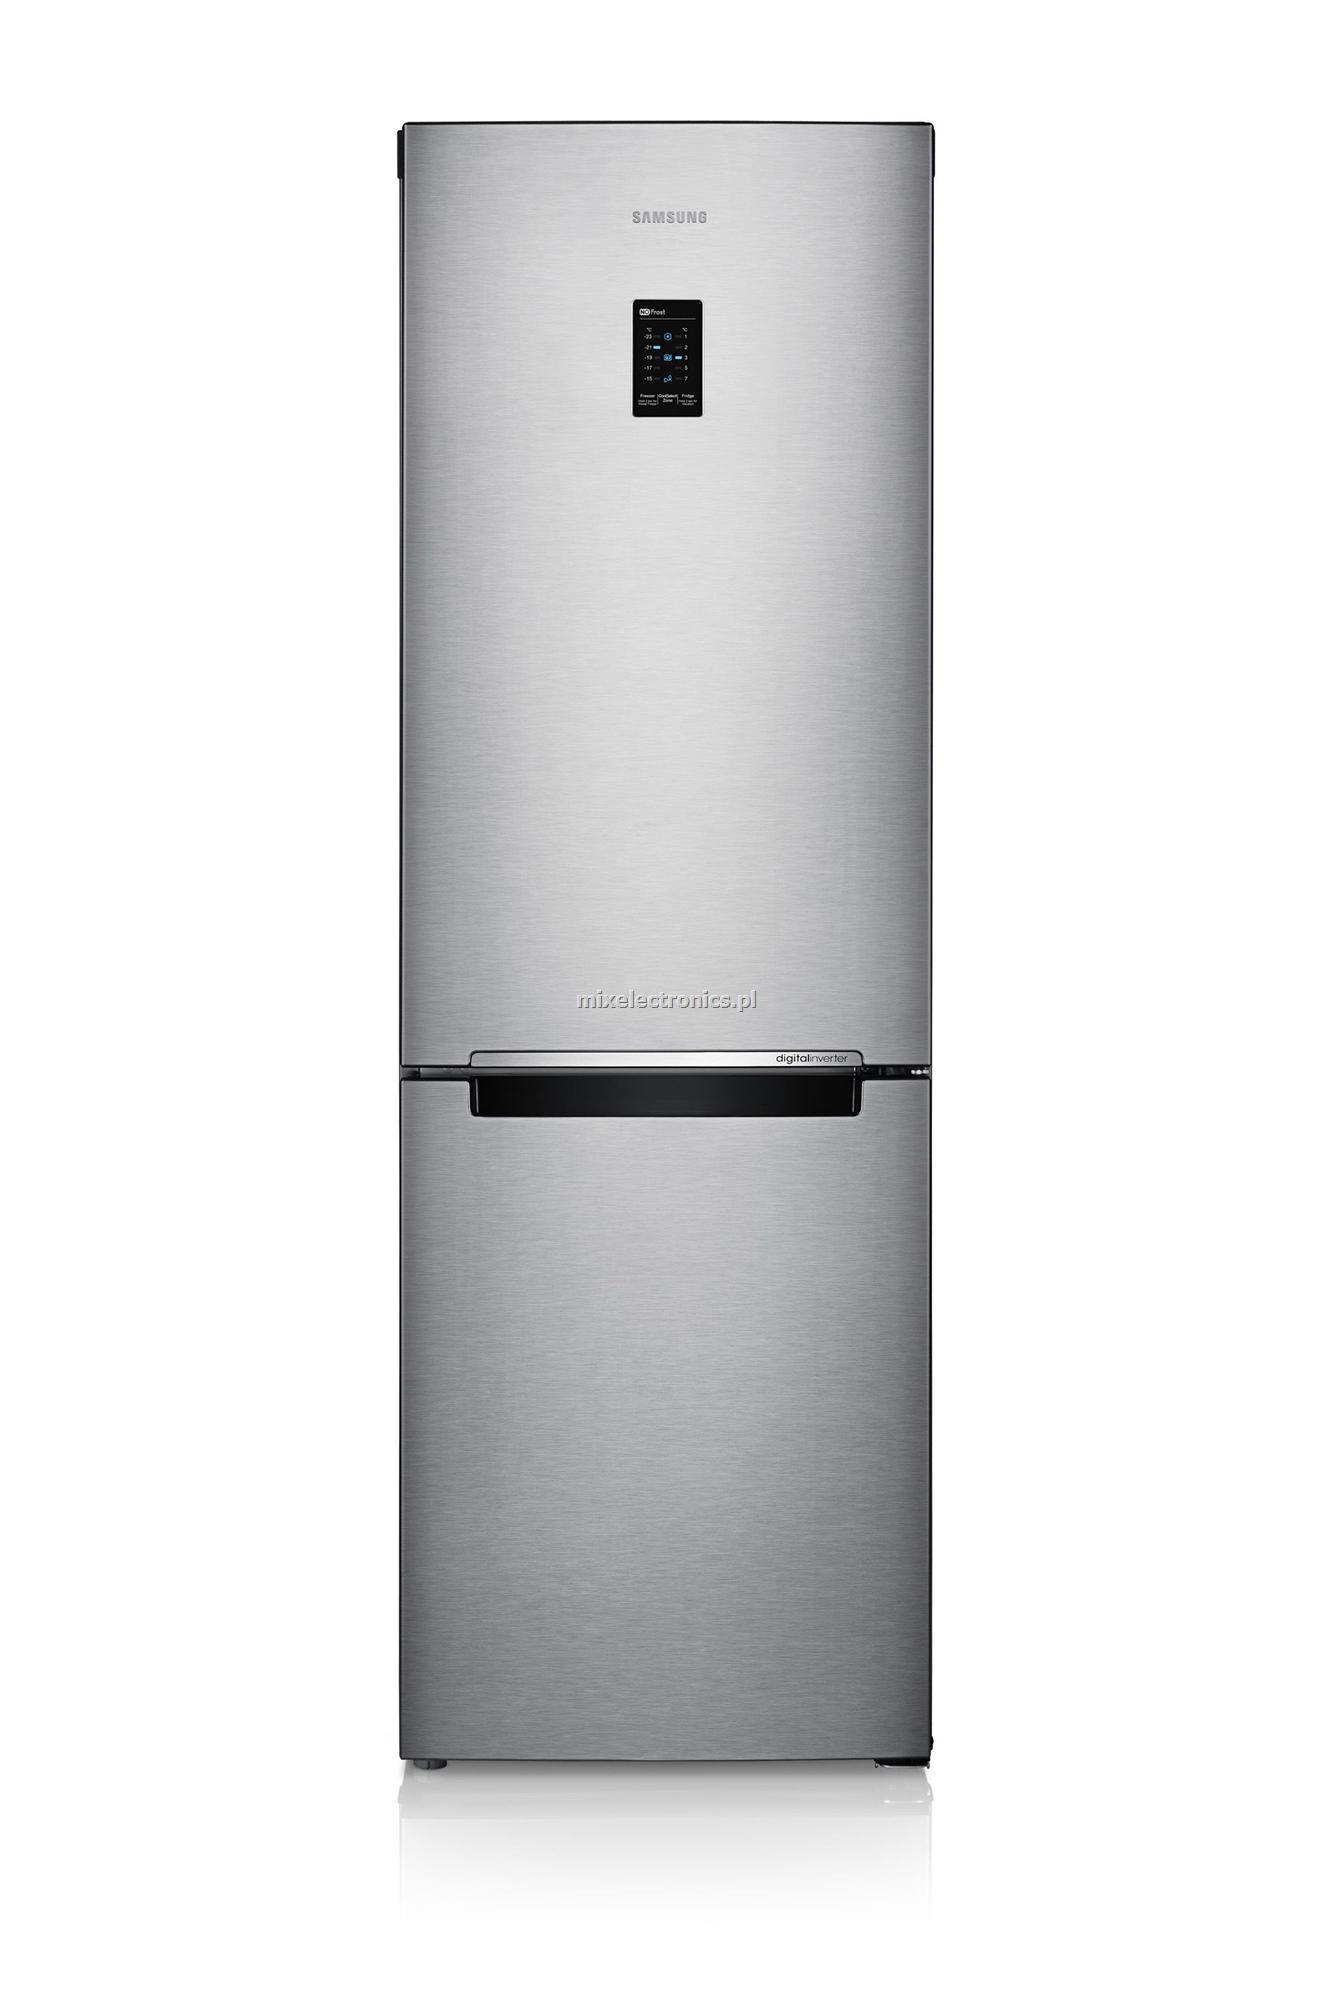 Samsung RB-31 FERNBSA